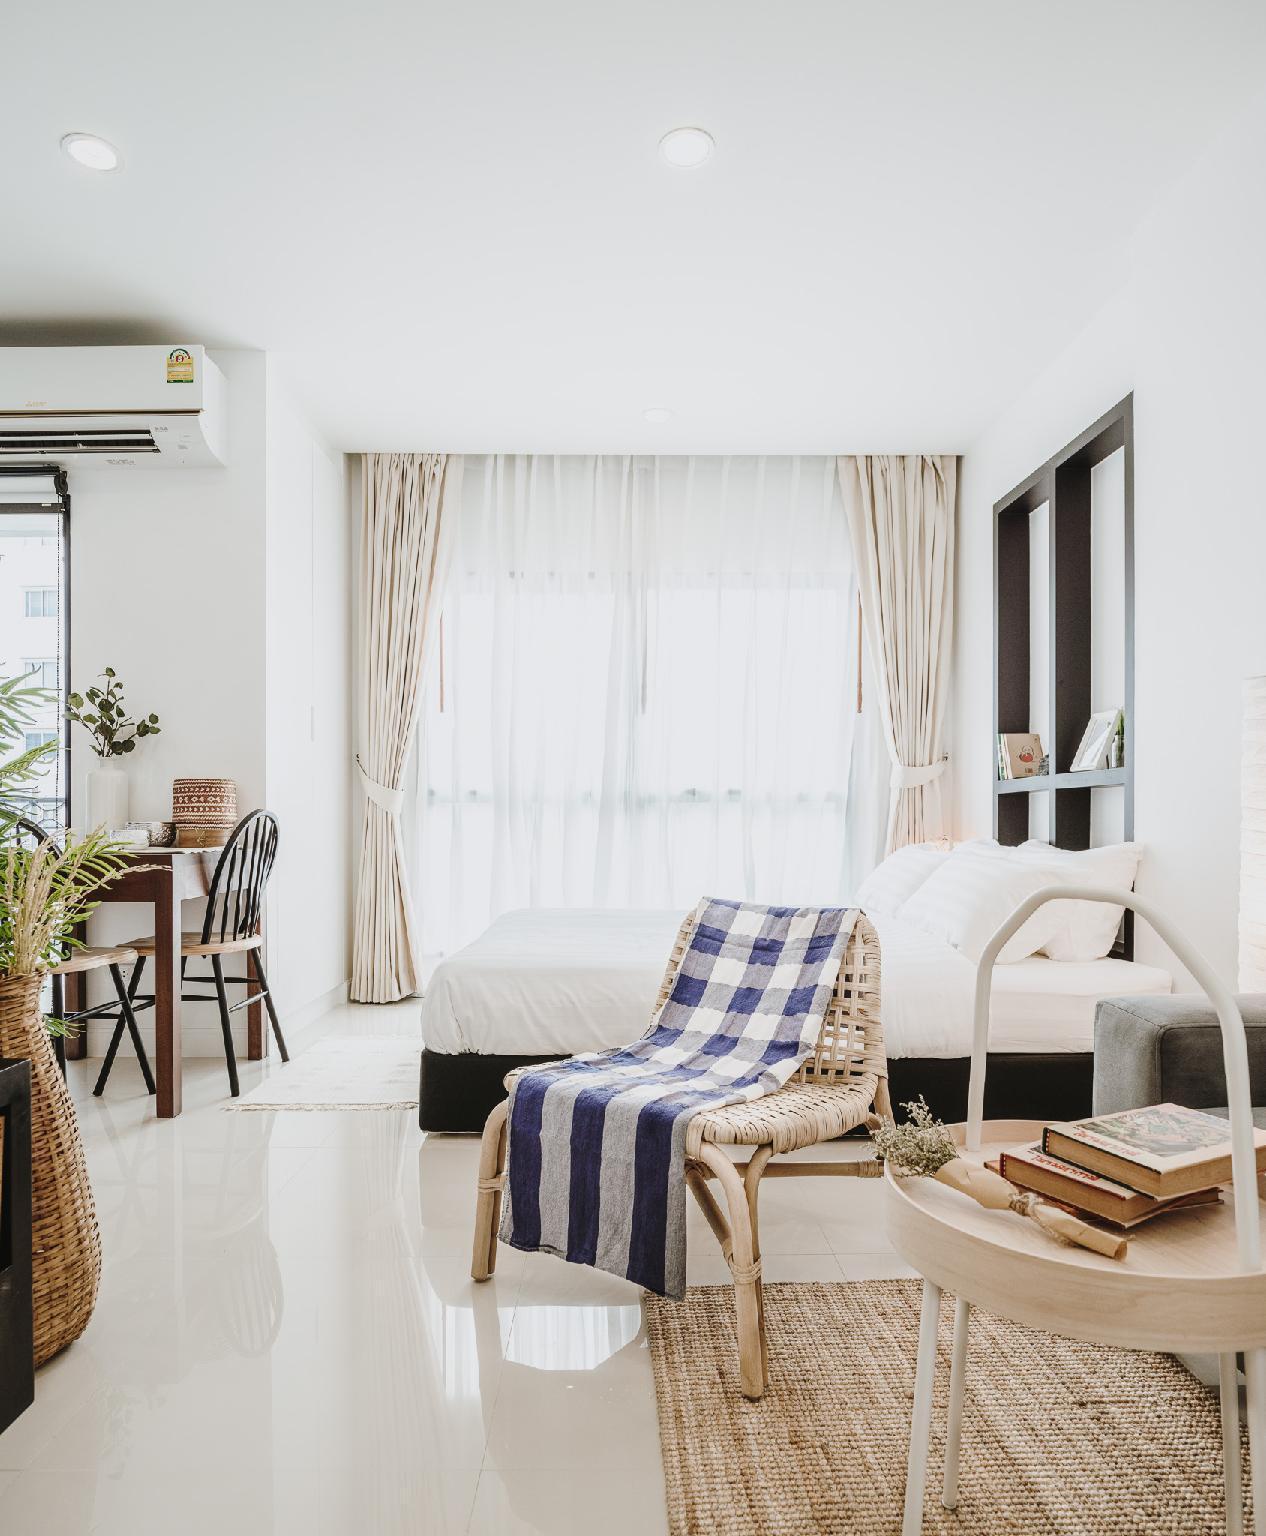 Siamplaengna Residence อพาร์ตเมนต์ 1 ห้องนอน 1 ห้องน้ำส่วนตัว ขนาด 23 ตร.ม. – รัชดาภิเษก